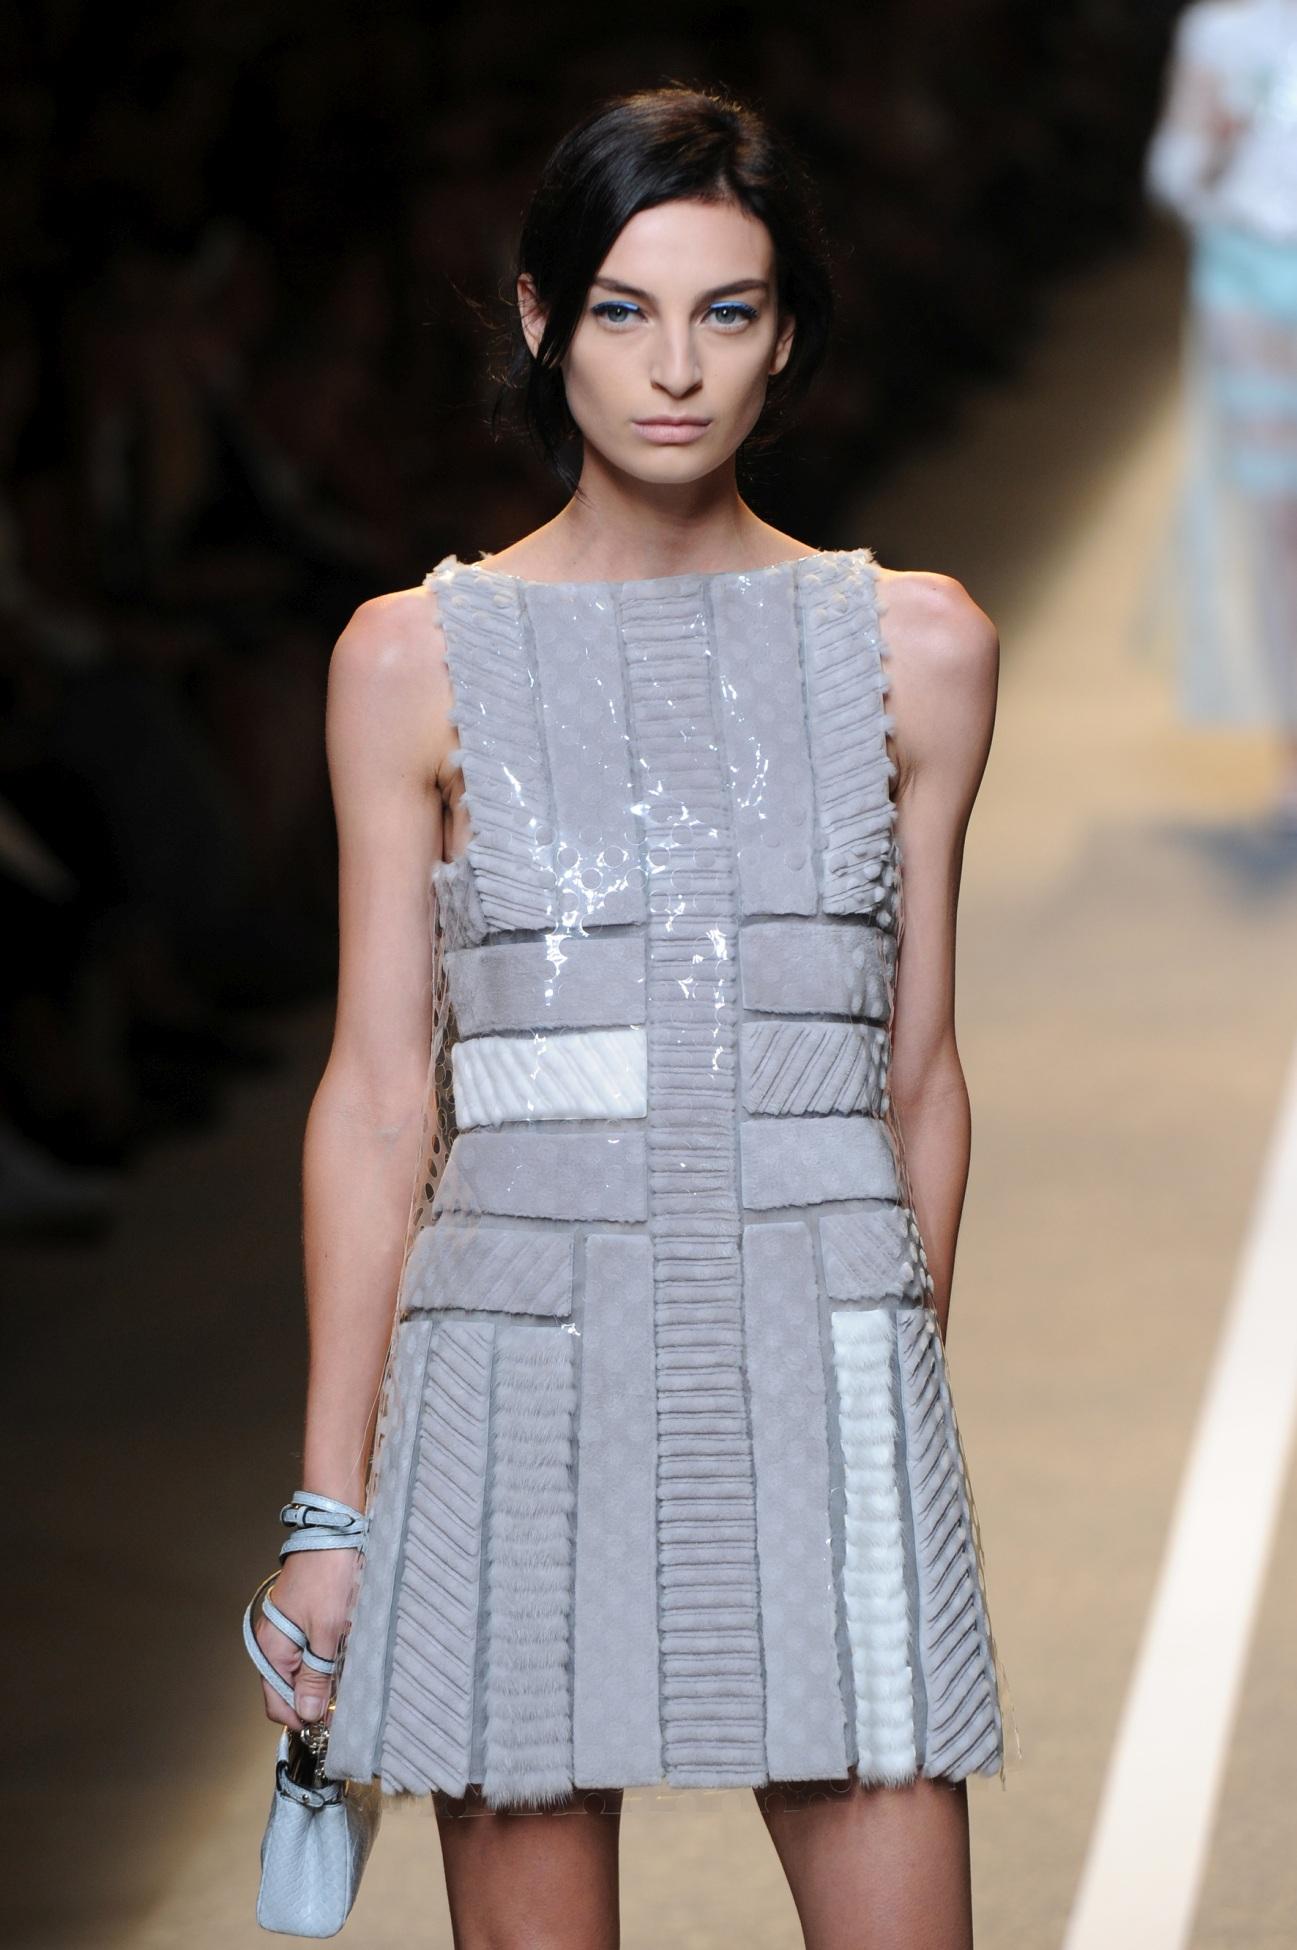 Fendi SS 2015 @ Milan Fashion Week